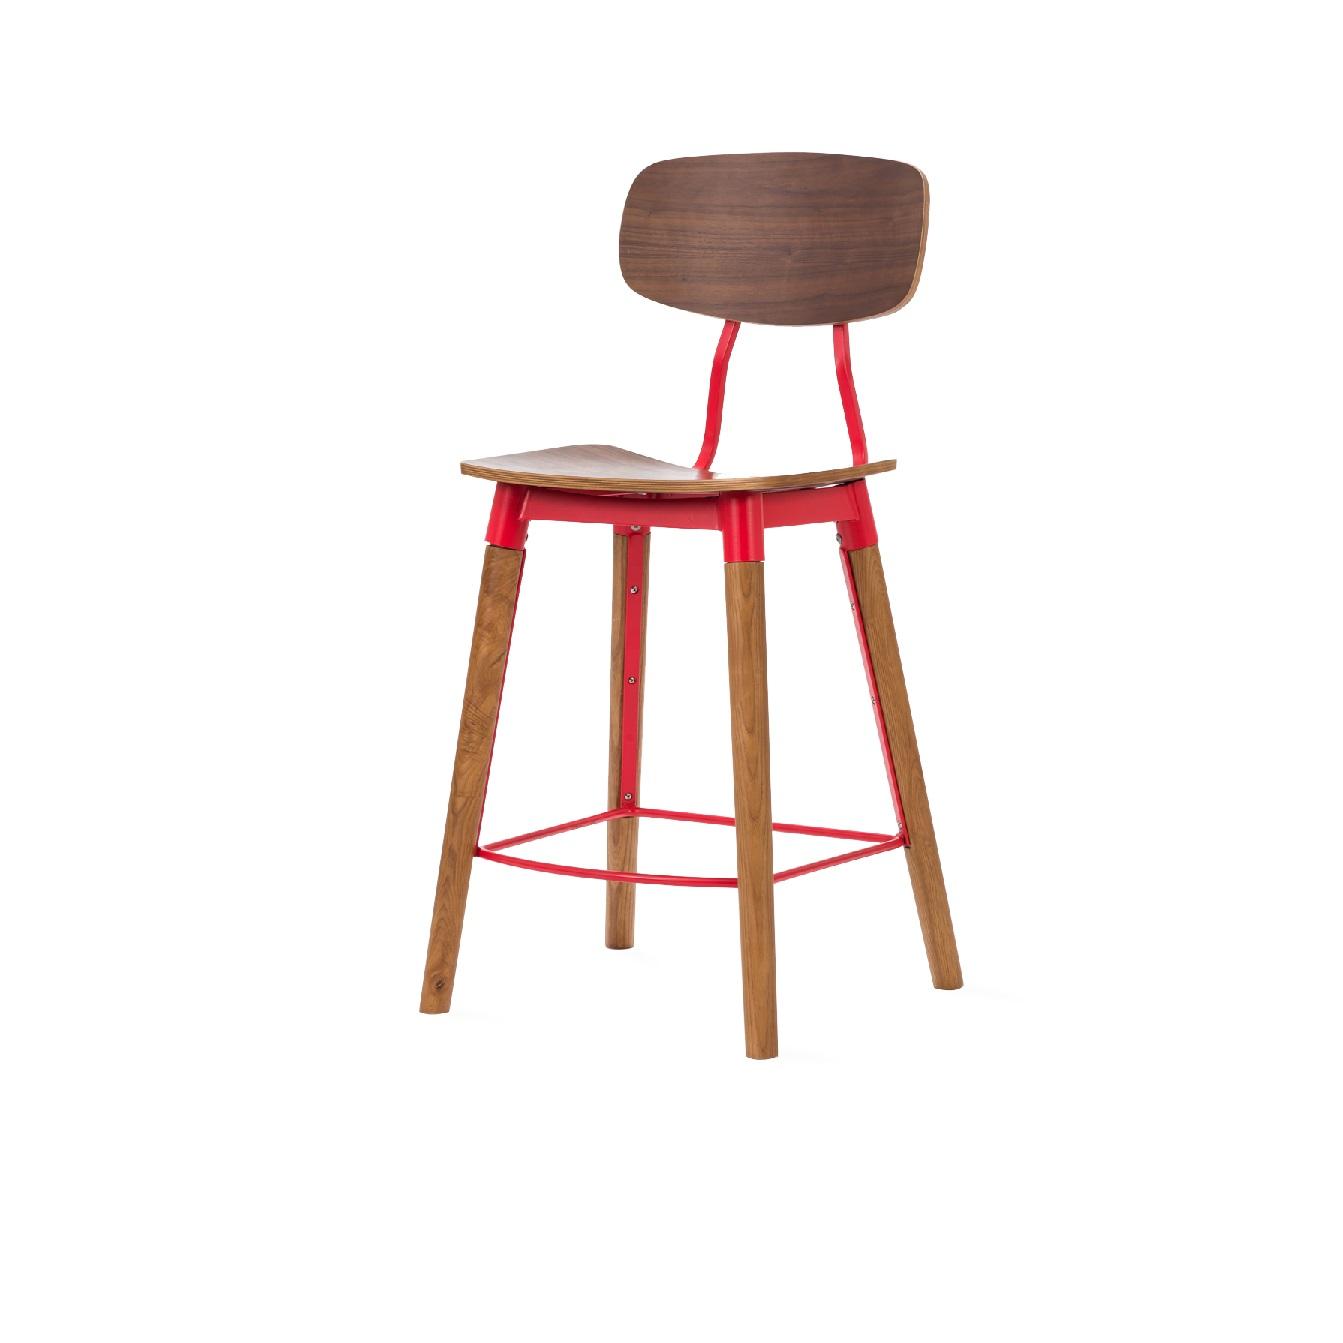 Барный стул Design FL 15439022 от thefurnish